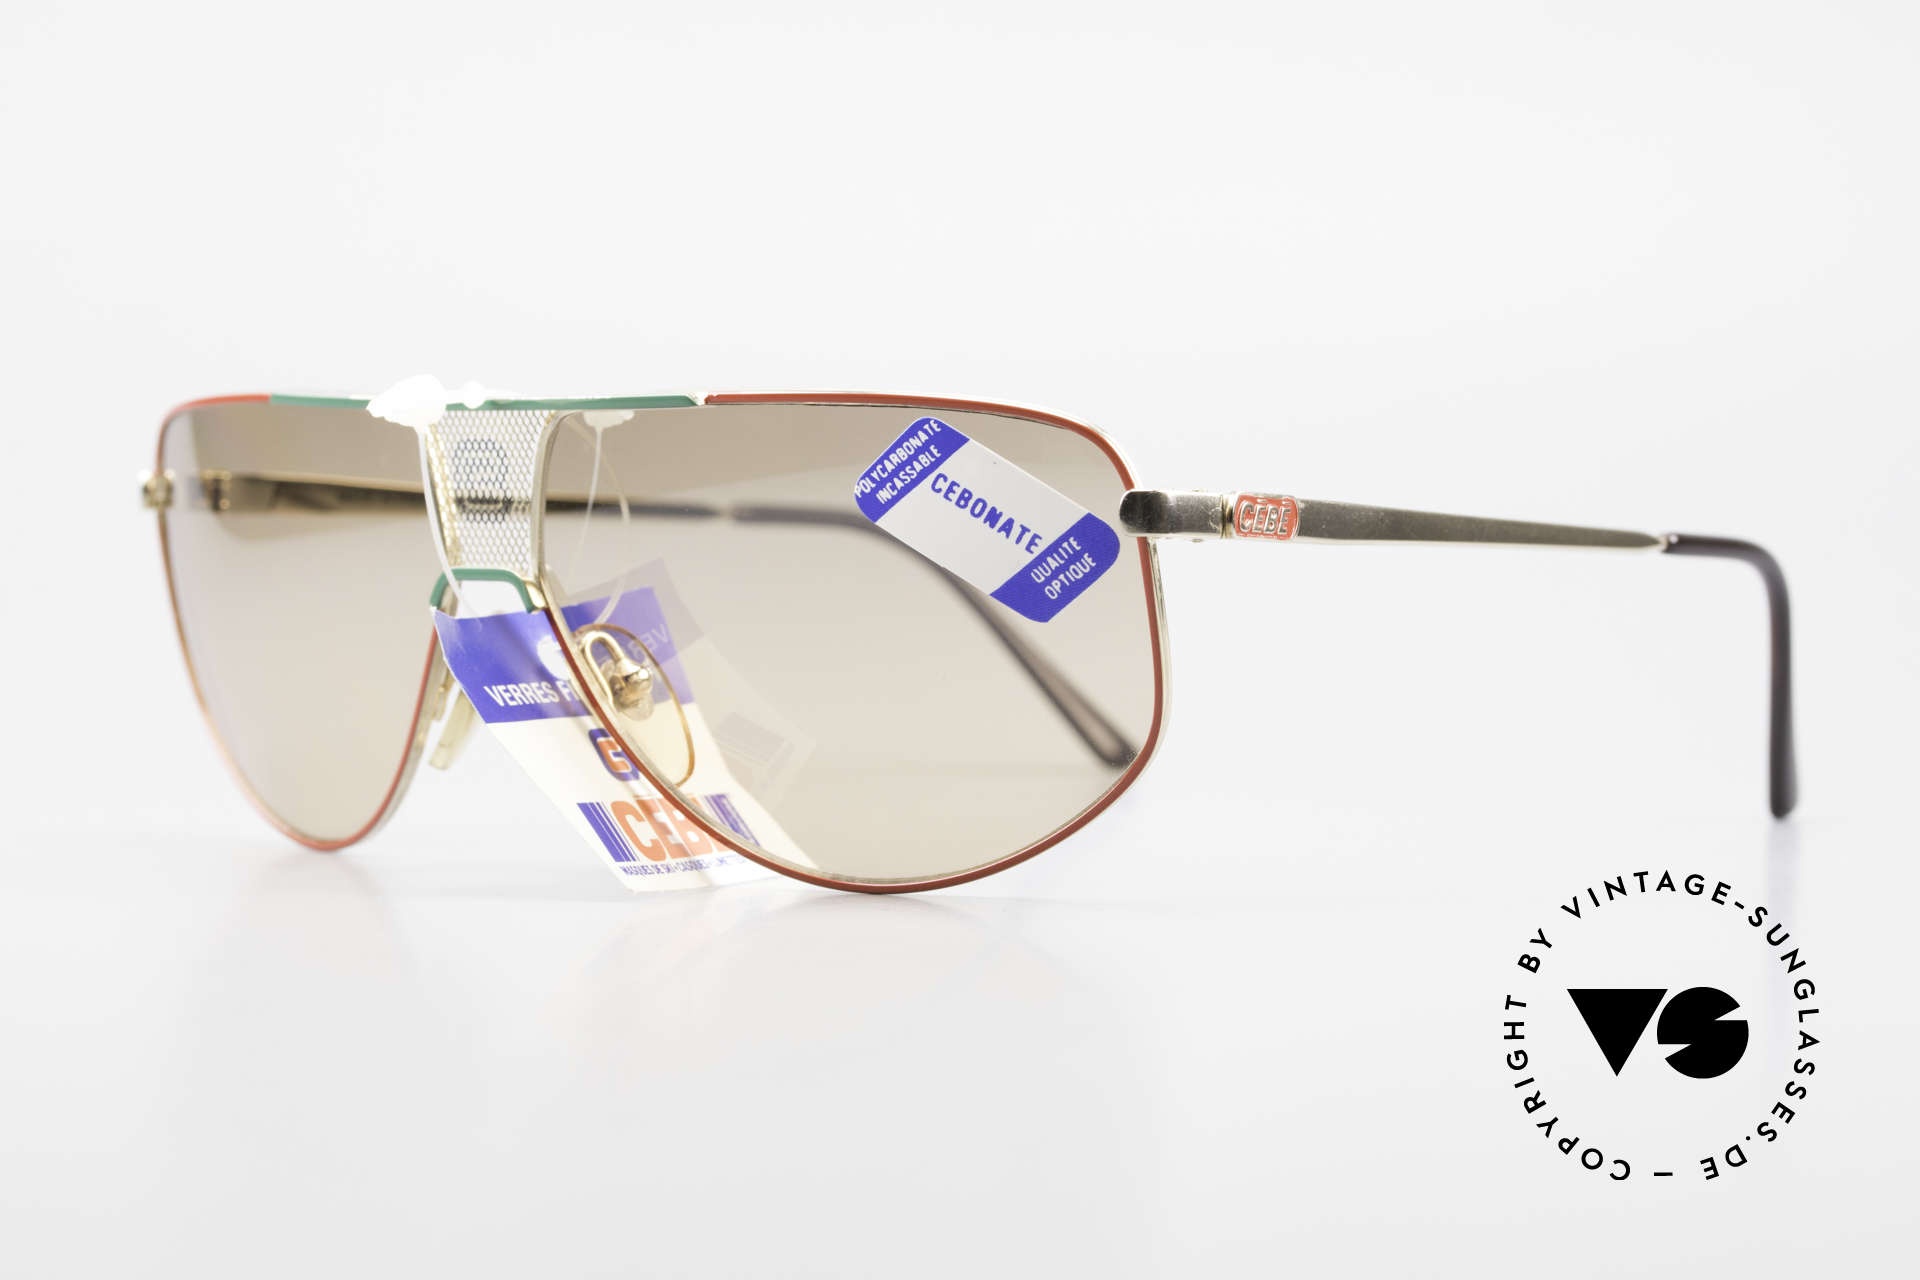 Cebe 0299 90's Ski Sports Sunglasses, carbonate sun lenses for extreme sun intensity; 100%, Made for Men and Women